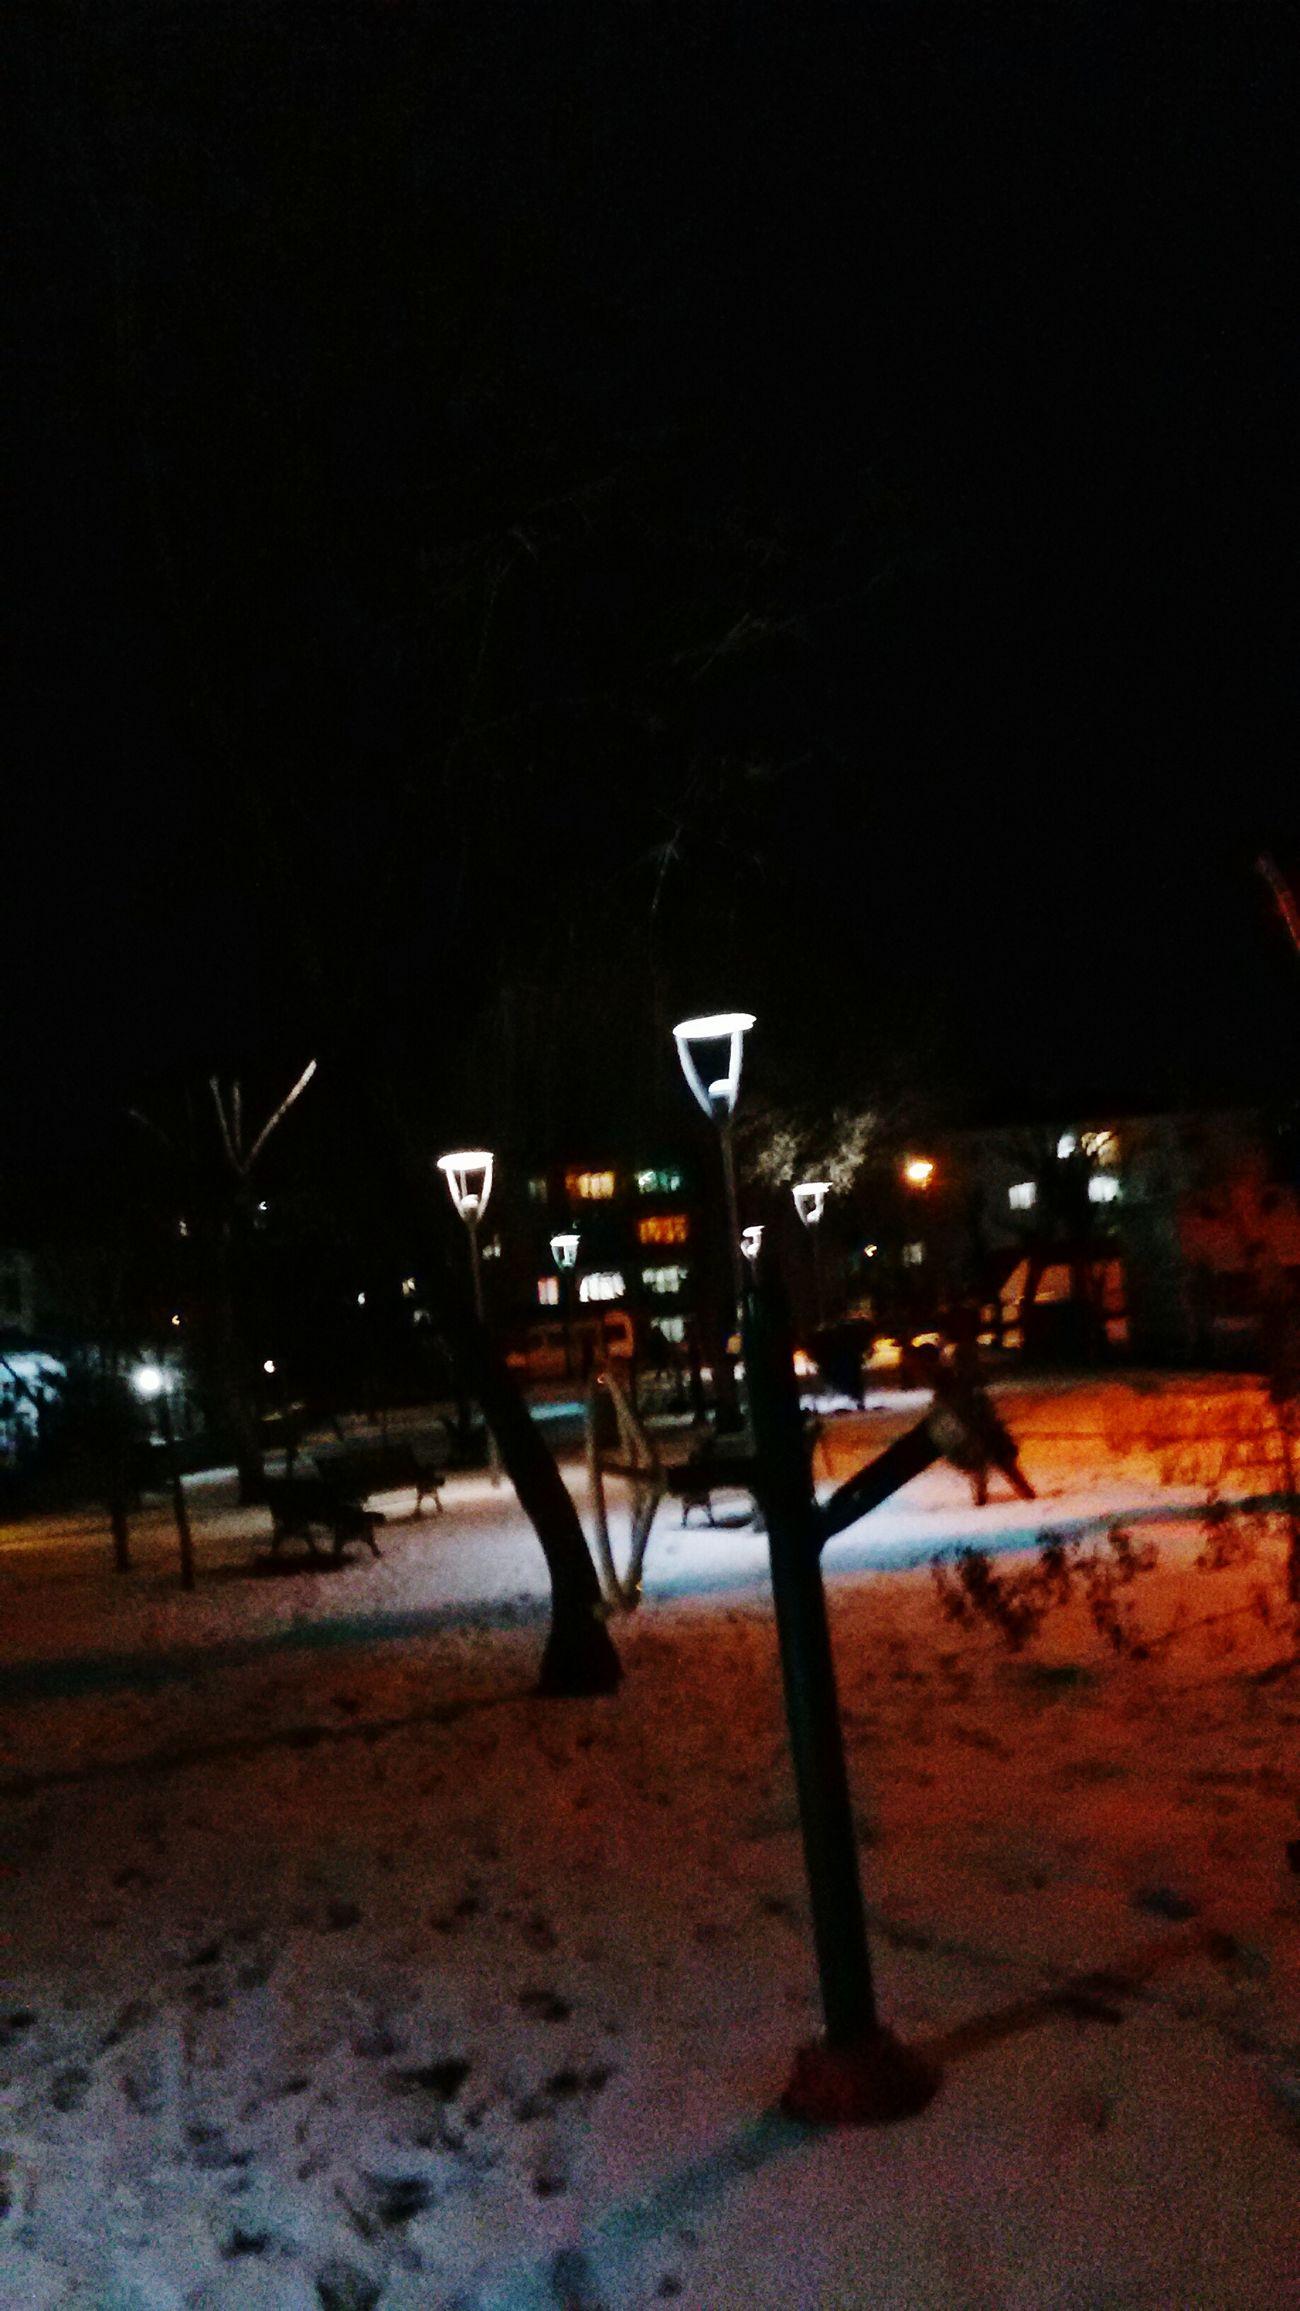 Night Illuminated Outdoors No People Sky 😒😞😜😋:-) 😄☺😉😏📷 😊☺☺☺ ✌✌ Day